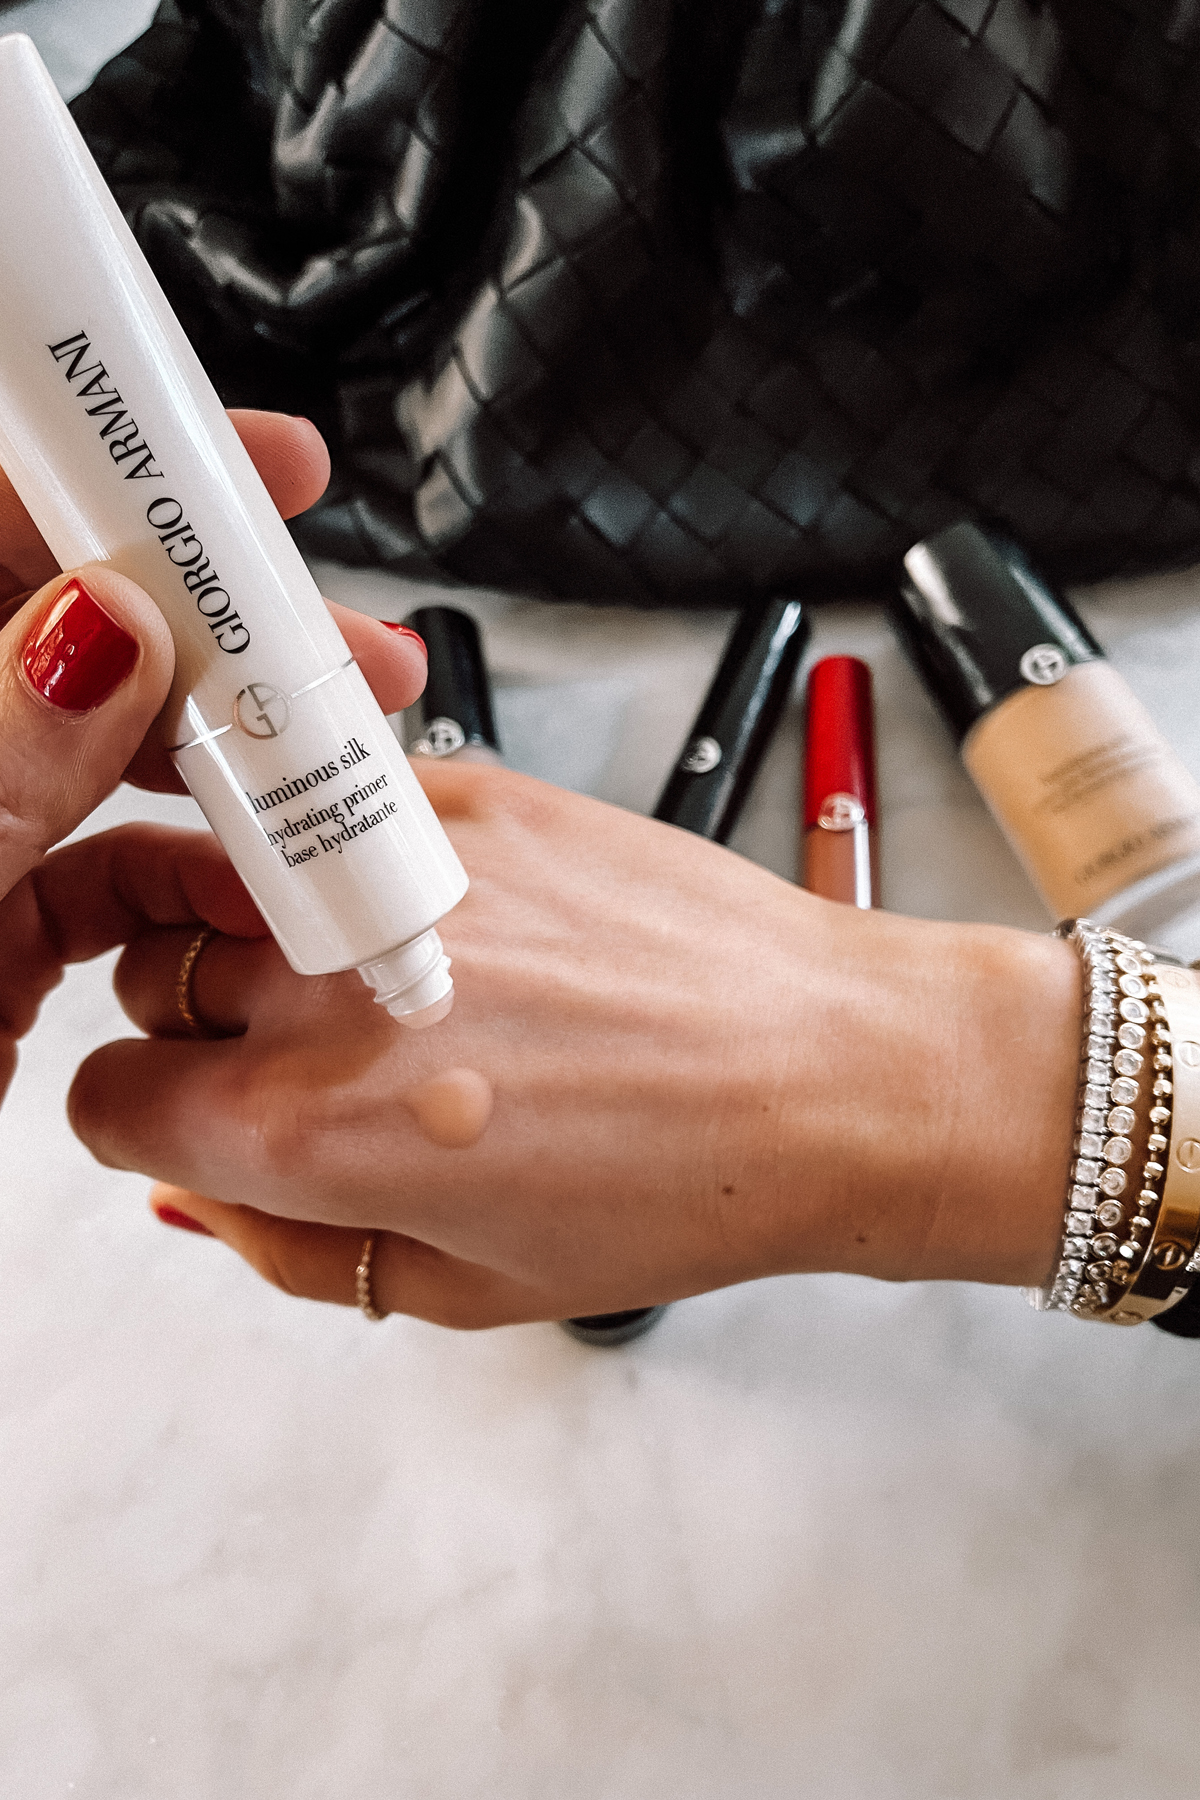 Fashion Jackson Sephora Beauty Armani Luminous Silk Hydrating Makeup Primer